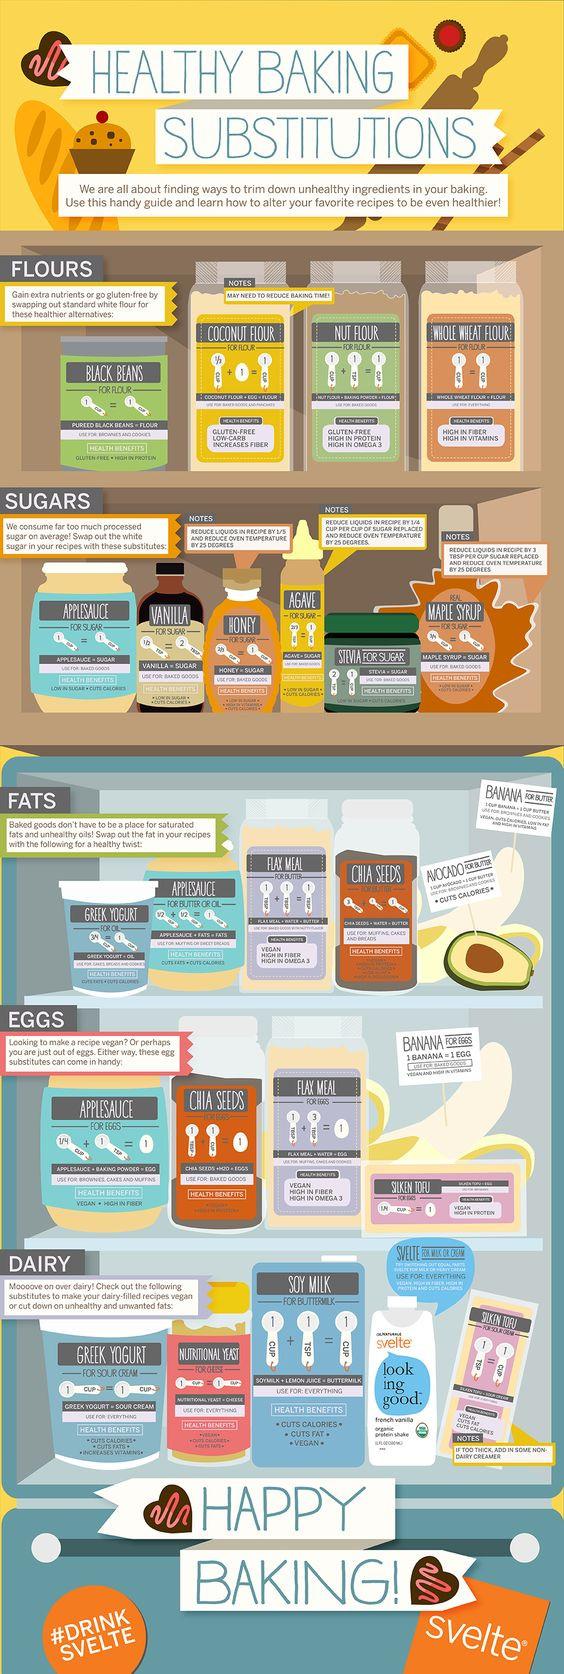 https://drinksvelte.com/2015/04/healthy-baking-substitutes/?pp=1